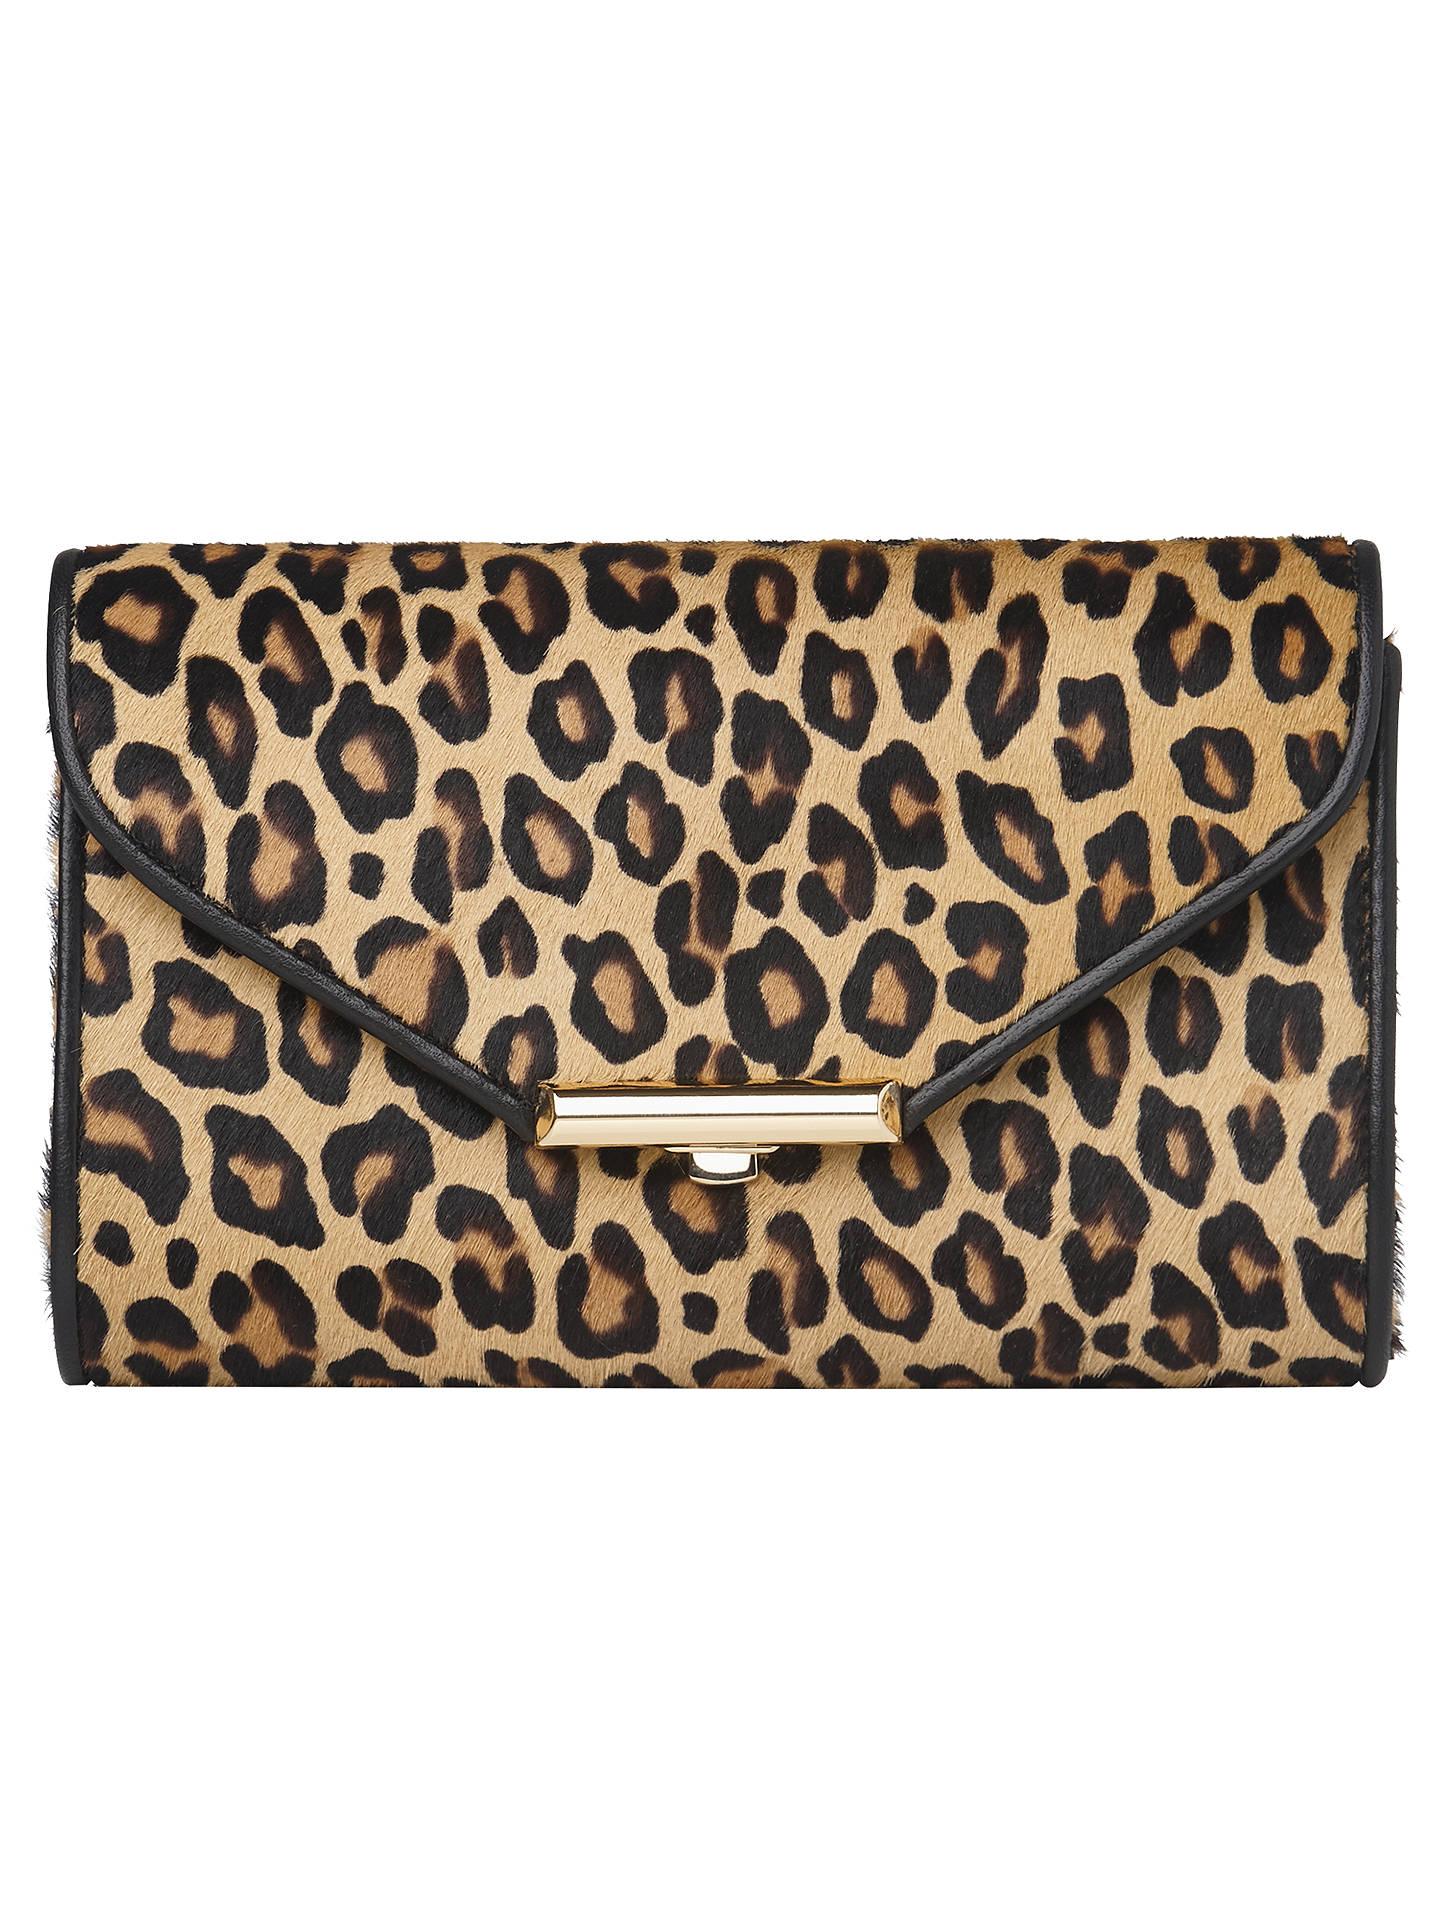 K Bennett Sissi Leopard Print Clutch Bag Neutral Online At Johnlewis